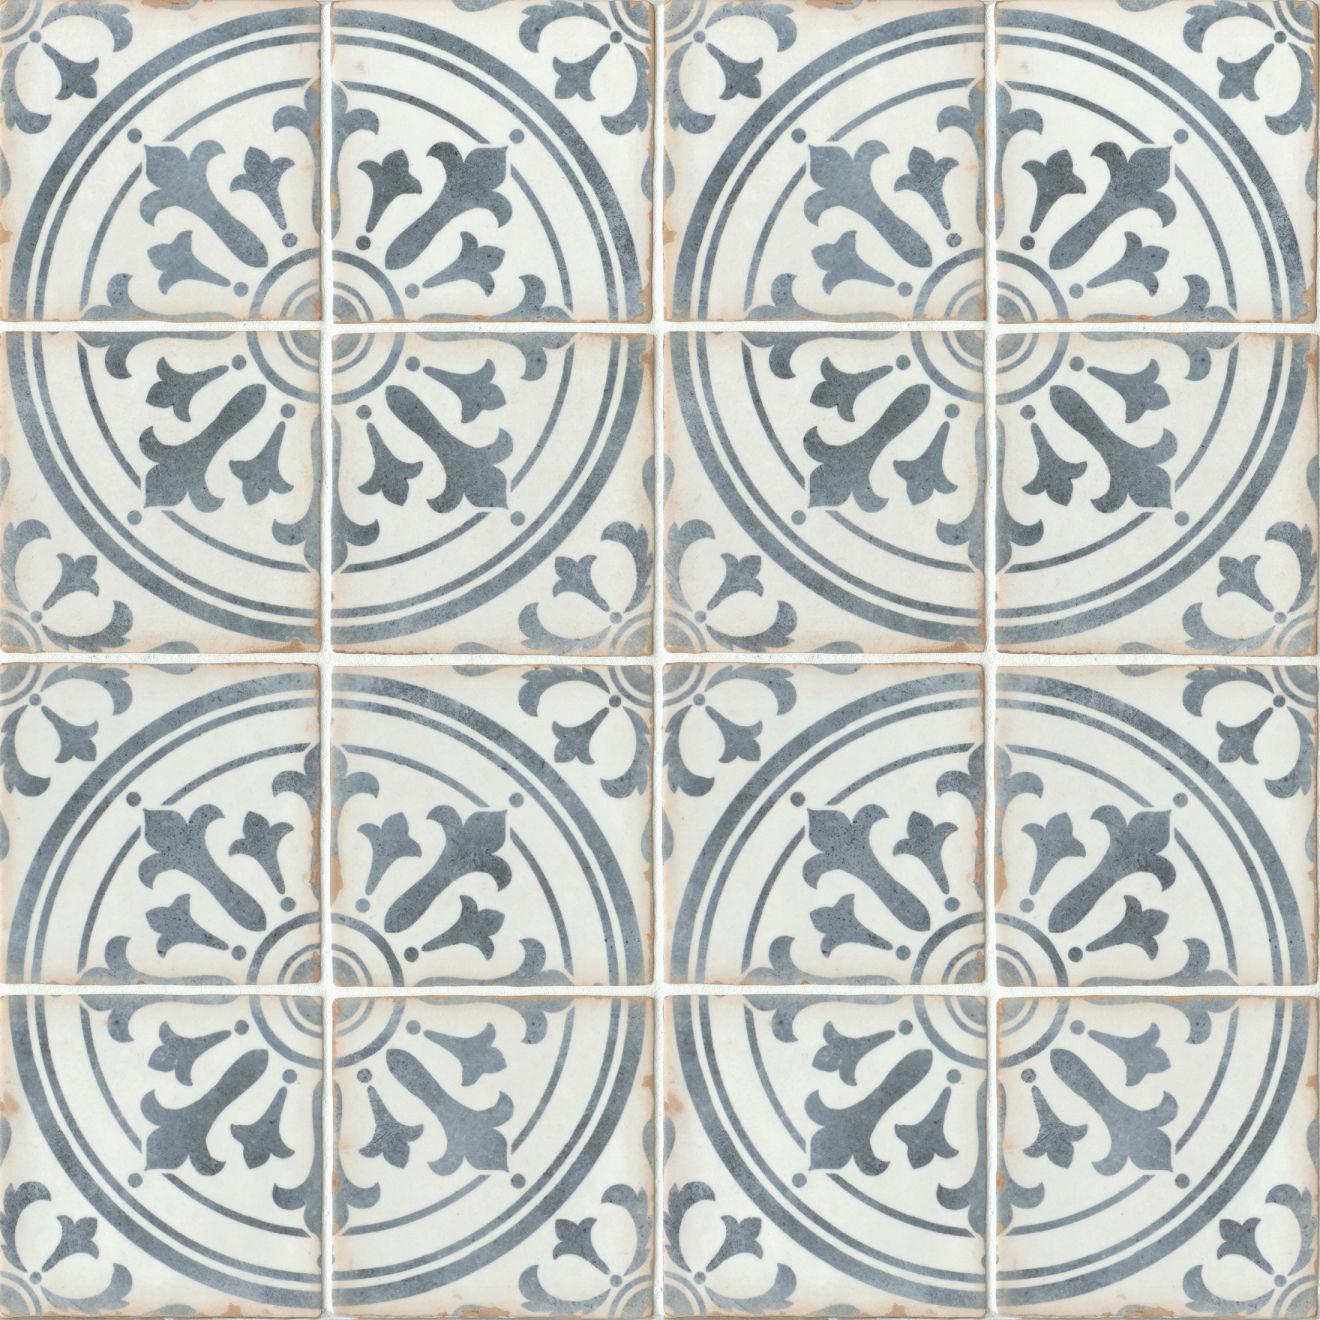 "Casablanca 5"" x 5"" Matte Ceramic Floor and Wall Tile in Ziane"